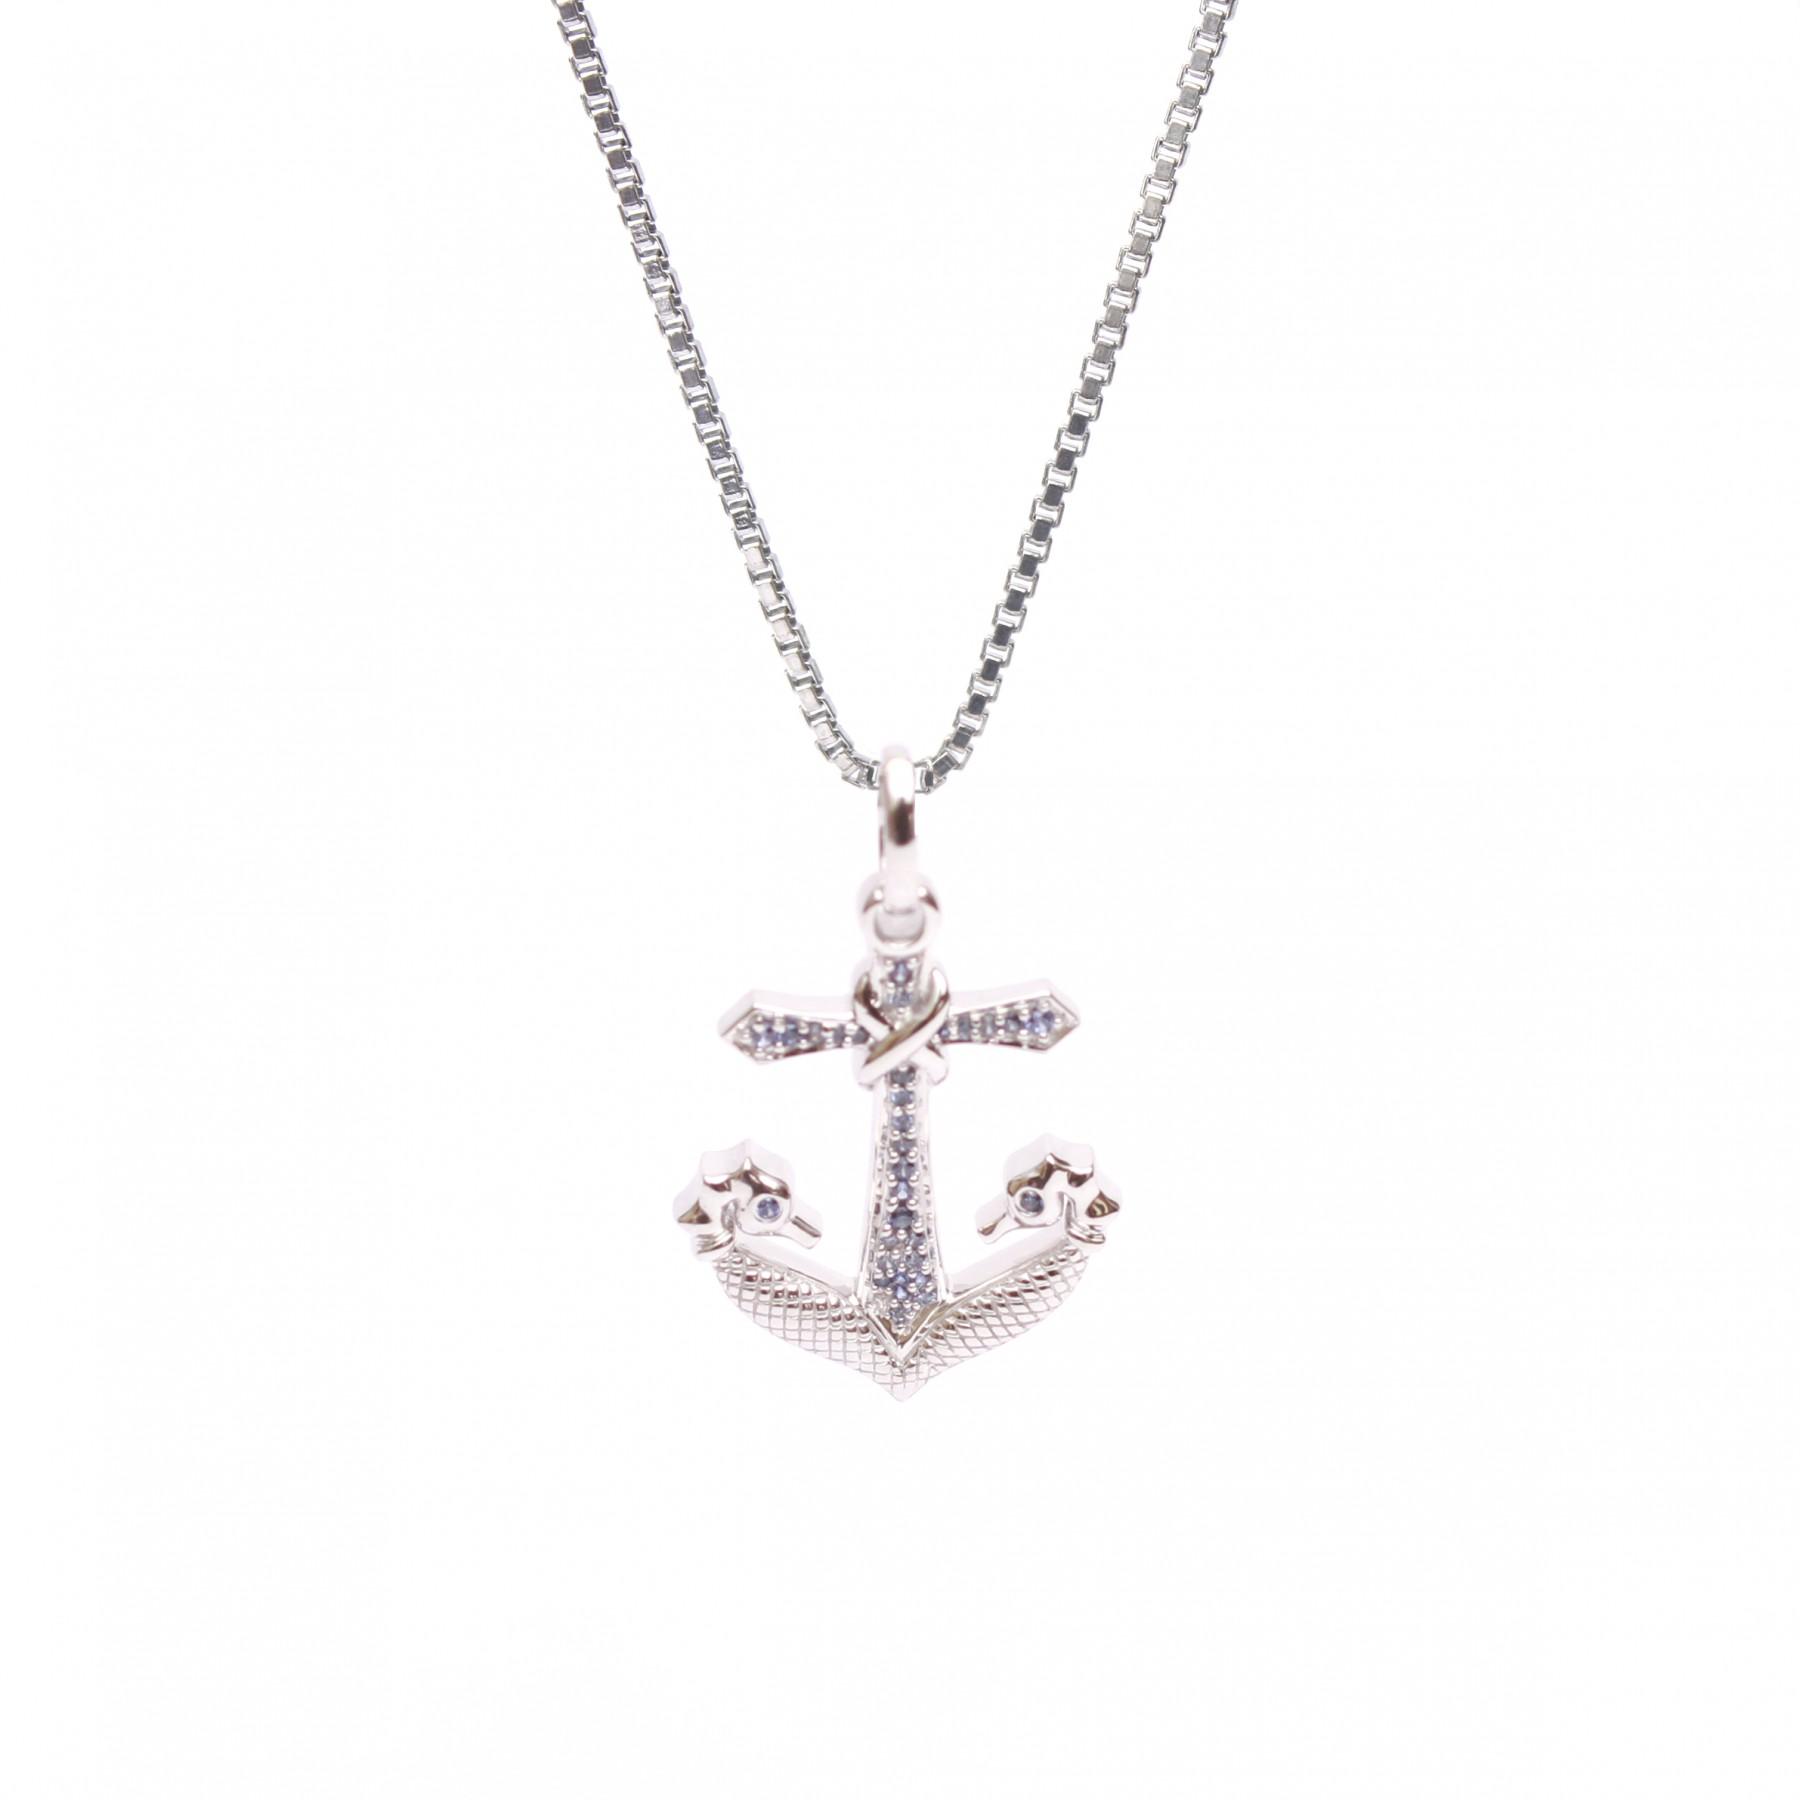 1800x1800 Twin Seahorse Anchor Pendant In Cz Diamond With Box Chain